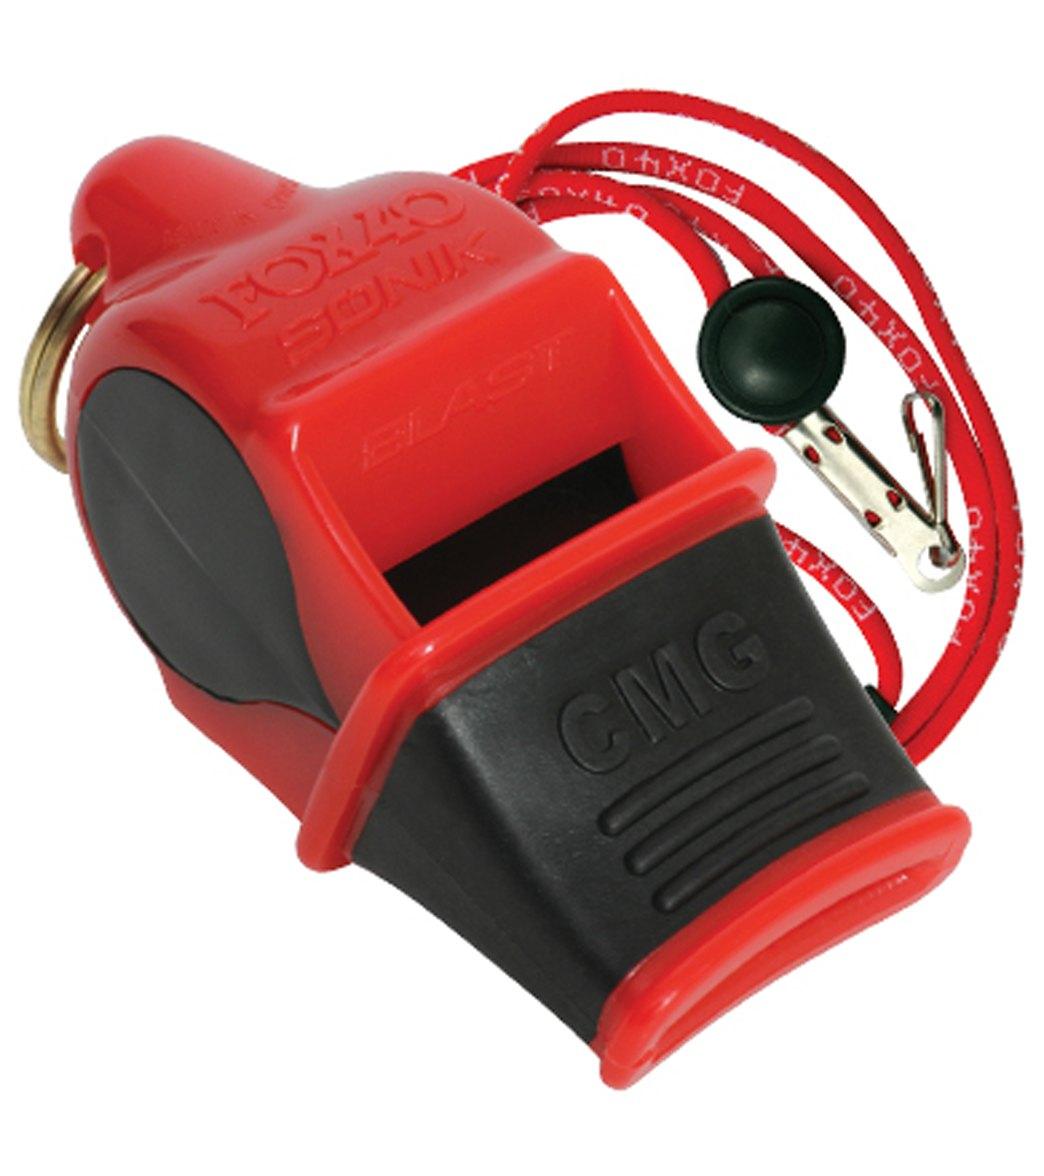 5499ac29b0eb Fox40 Sonik Blast CMG Multi Color Lifeguard Whistle w  Lanyard at ...